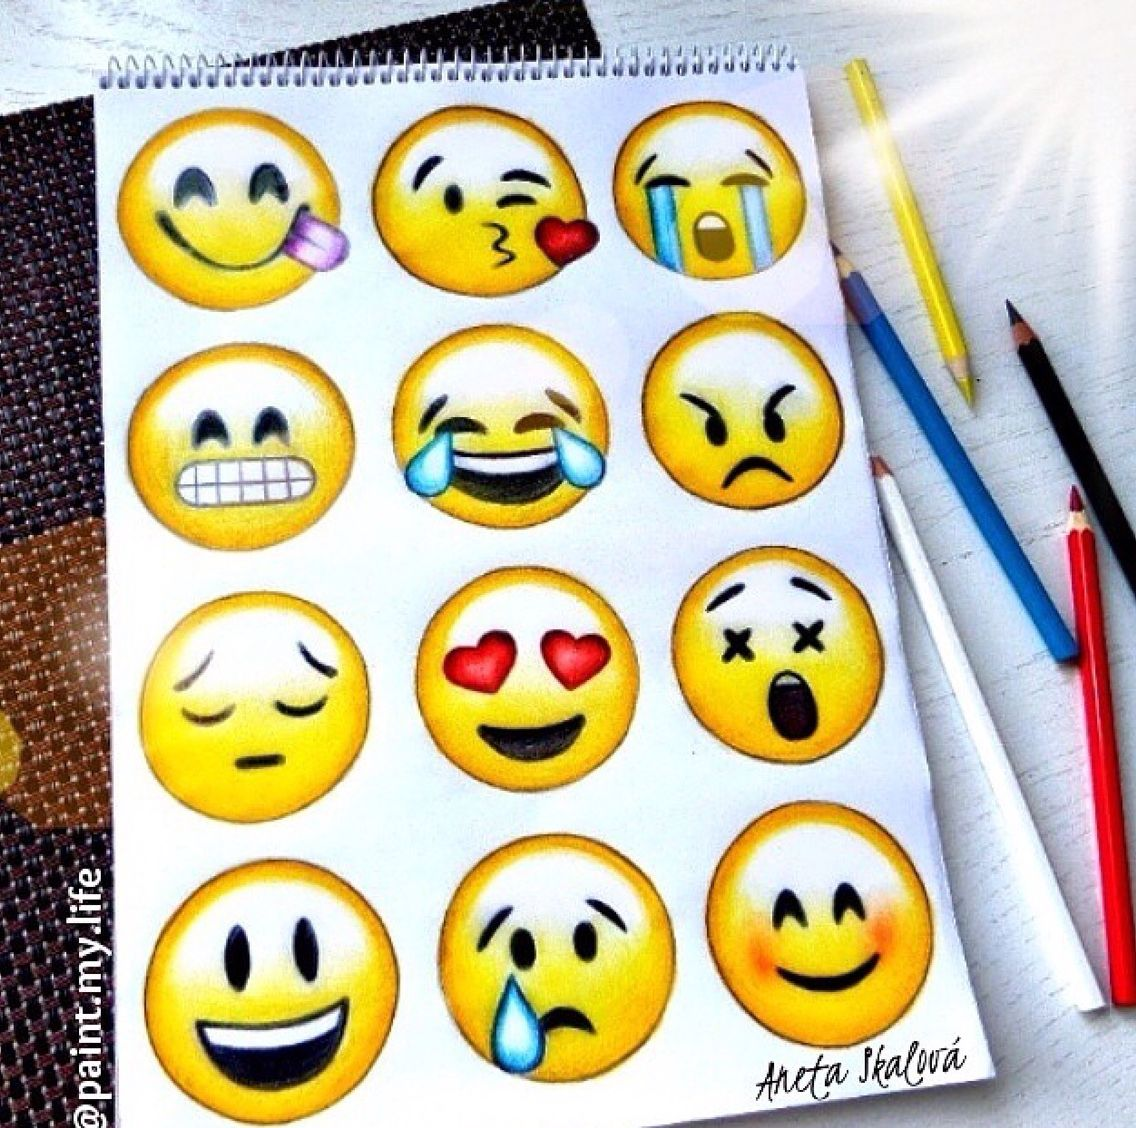 Emoji Drawing A Cool Quick Sketch To Do When Ur Bored Dessin Smiley Dessin Emoji Et Dessins Colores